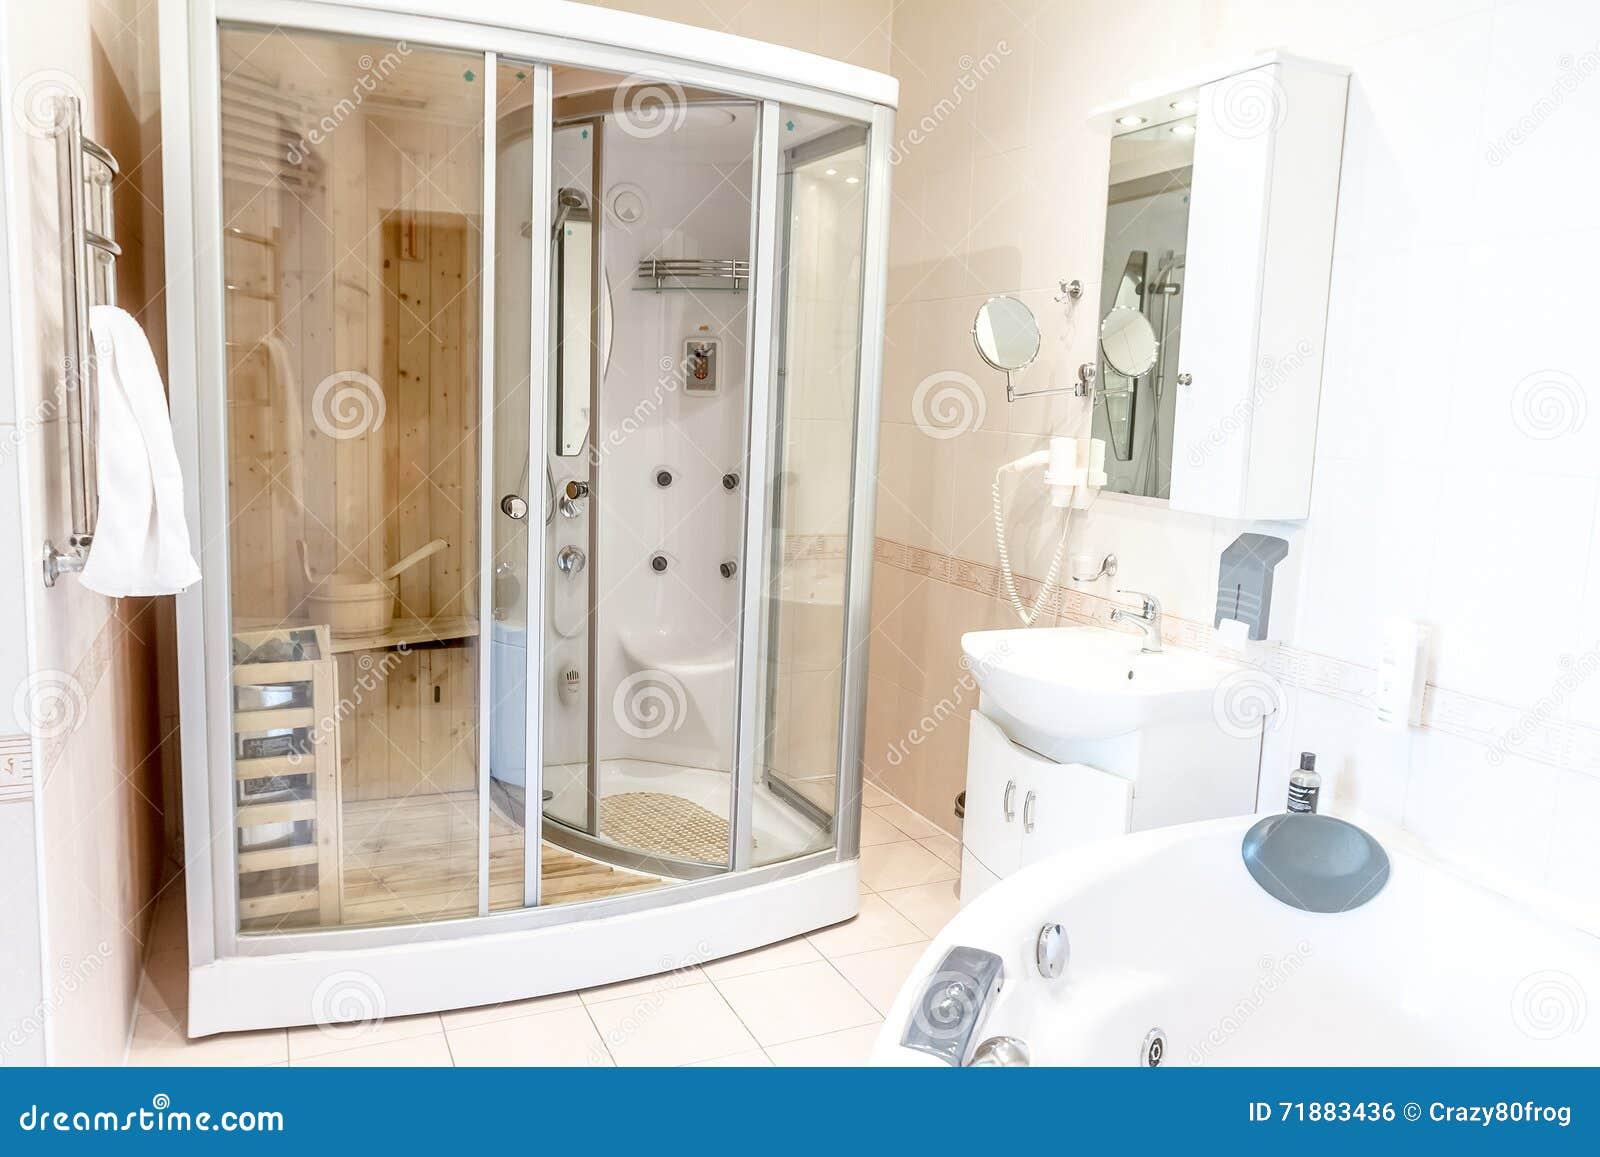 Spa Bastukabin I Badrum, Hus Eller Hotell Arkivfoto - Bild: 71883436 : spa badrum : Badrum